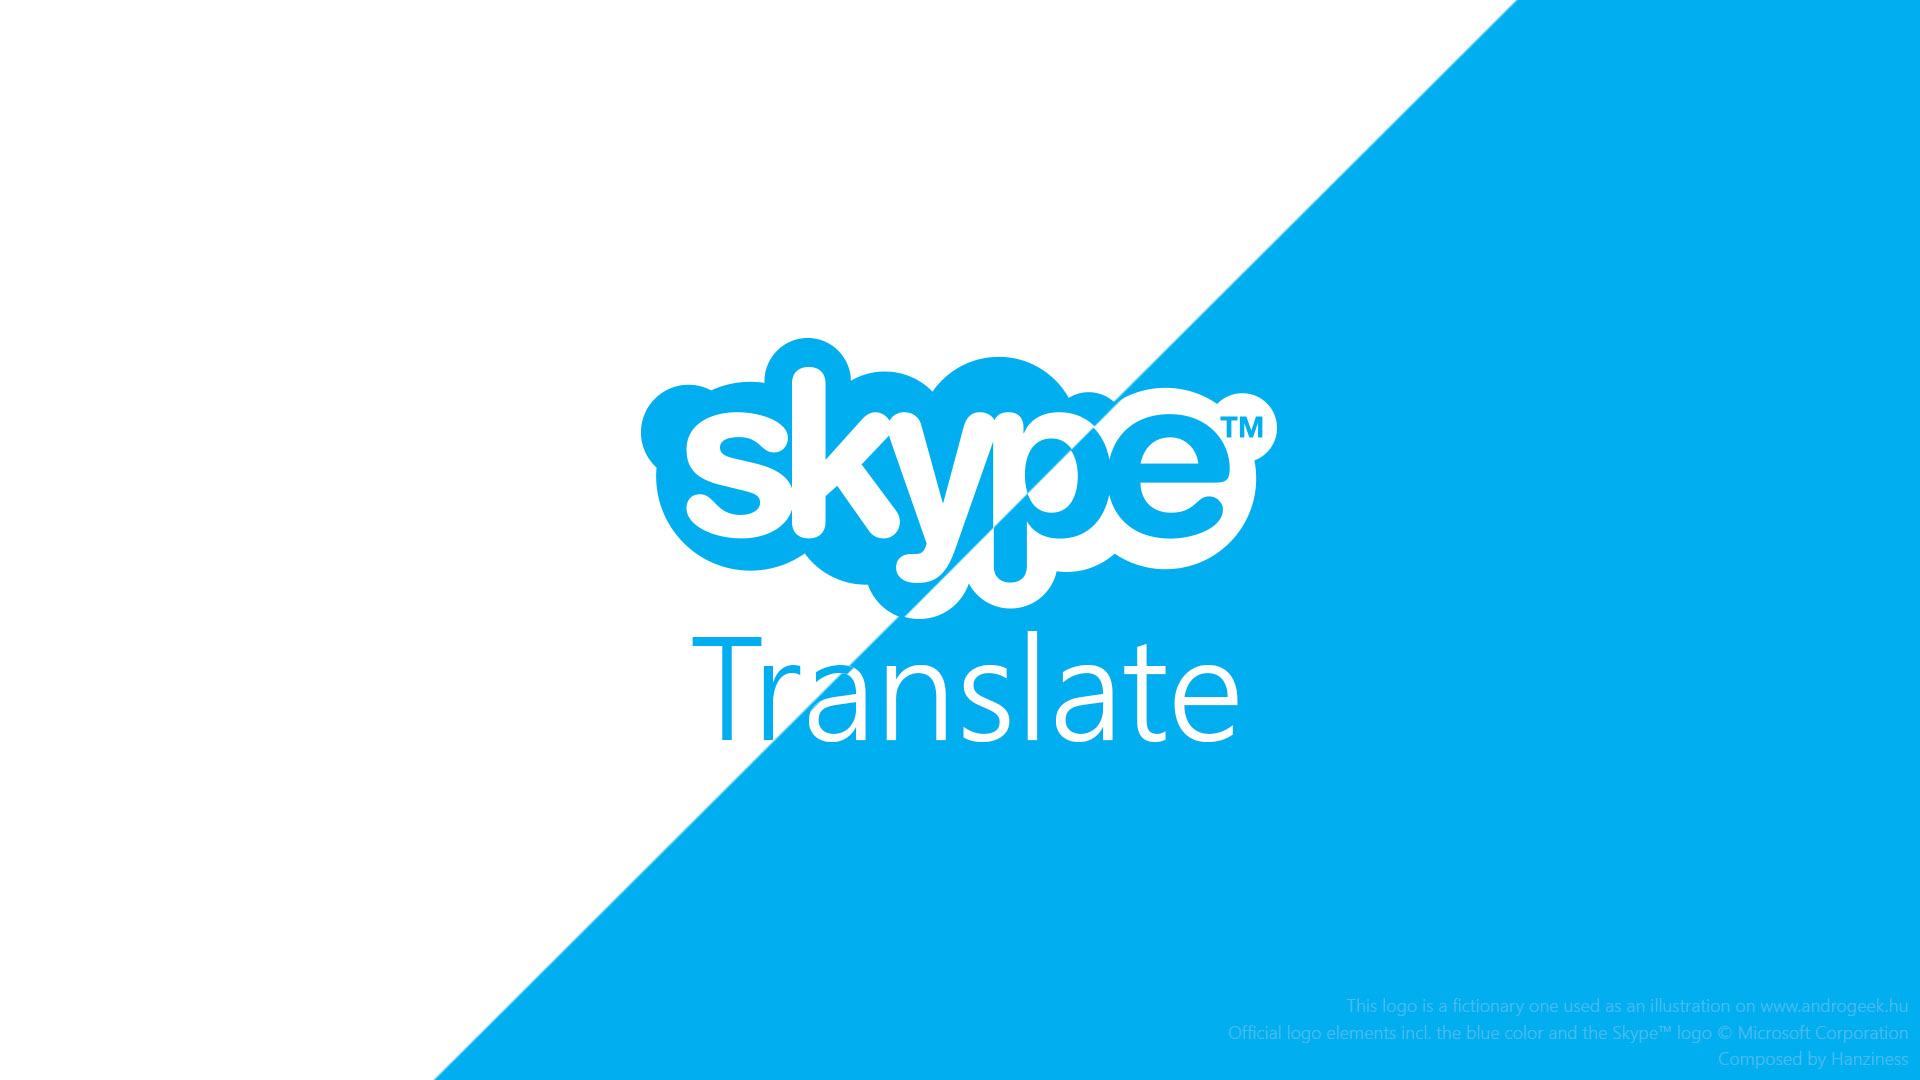 SkypeTranslateIntroduced_MCG